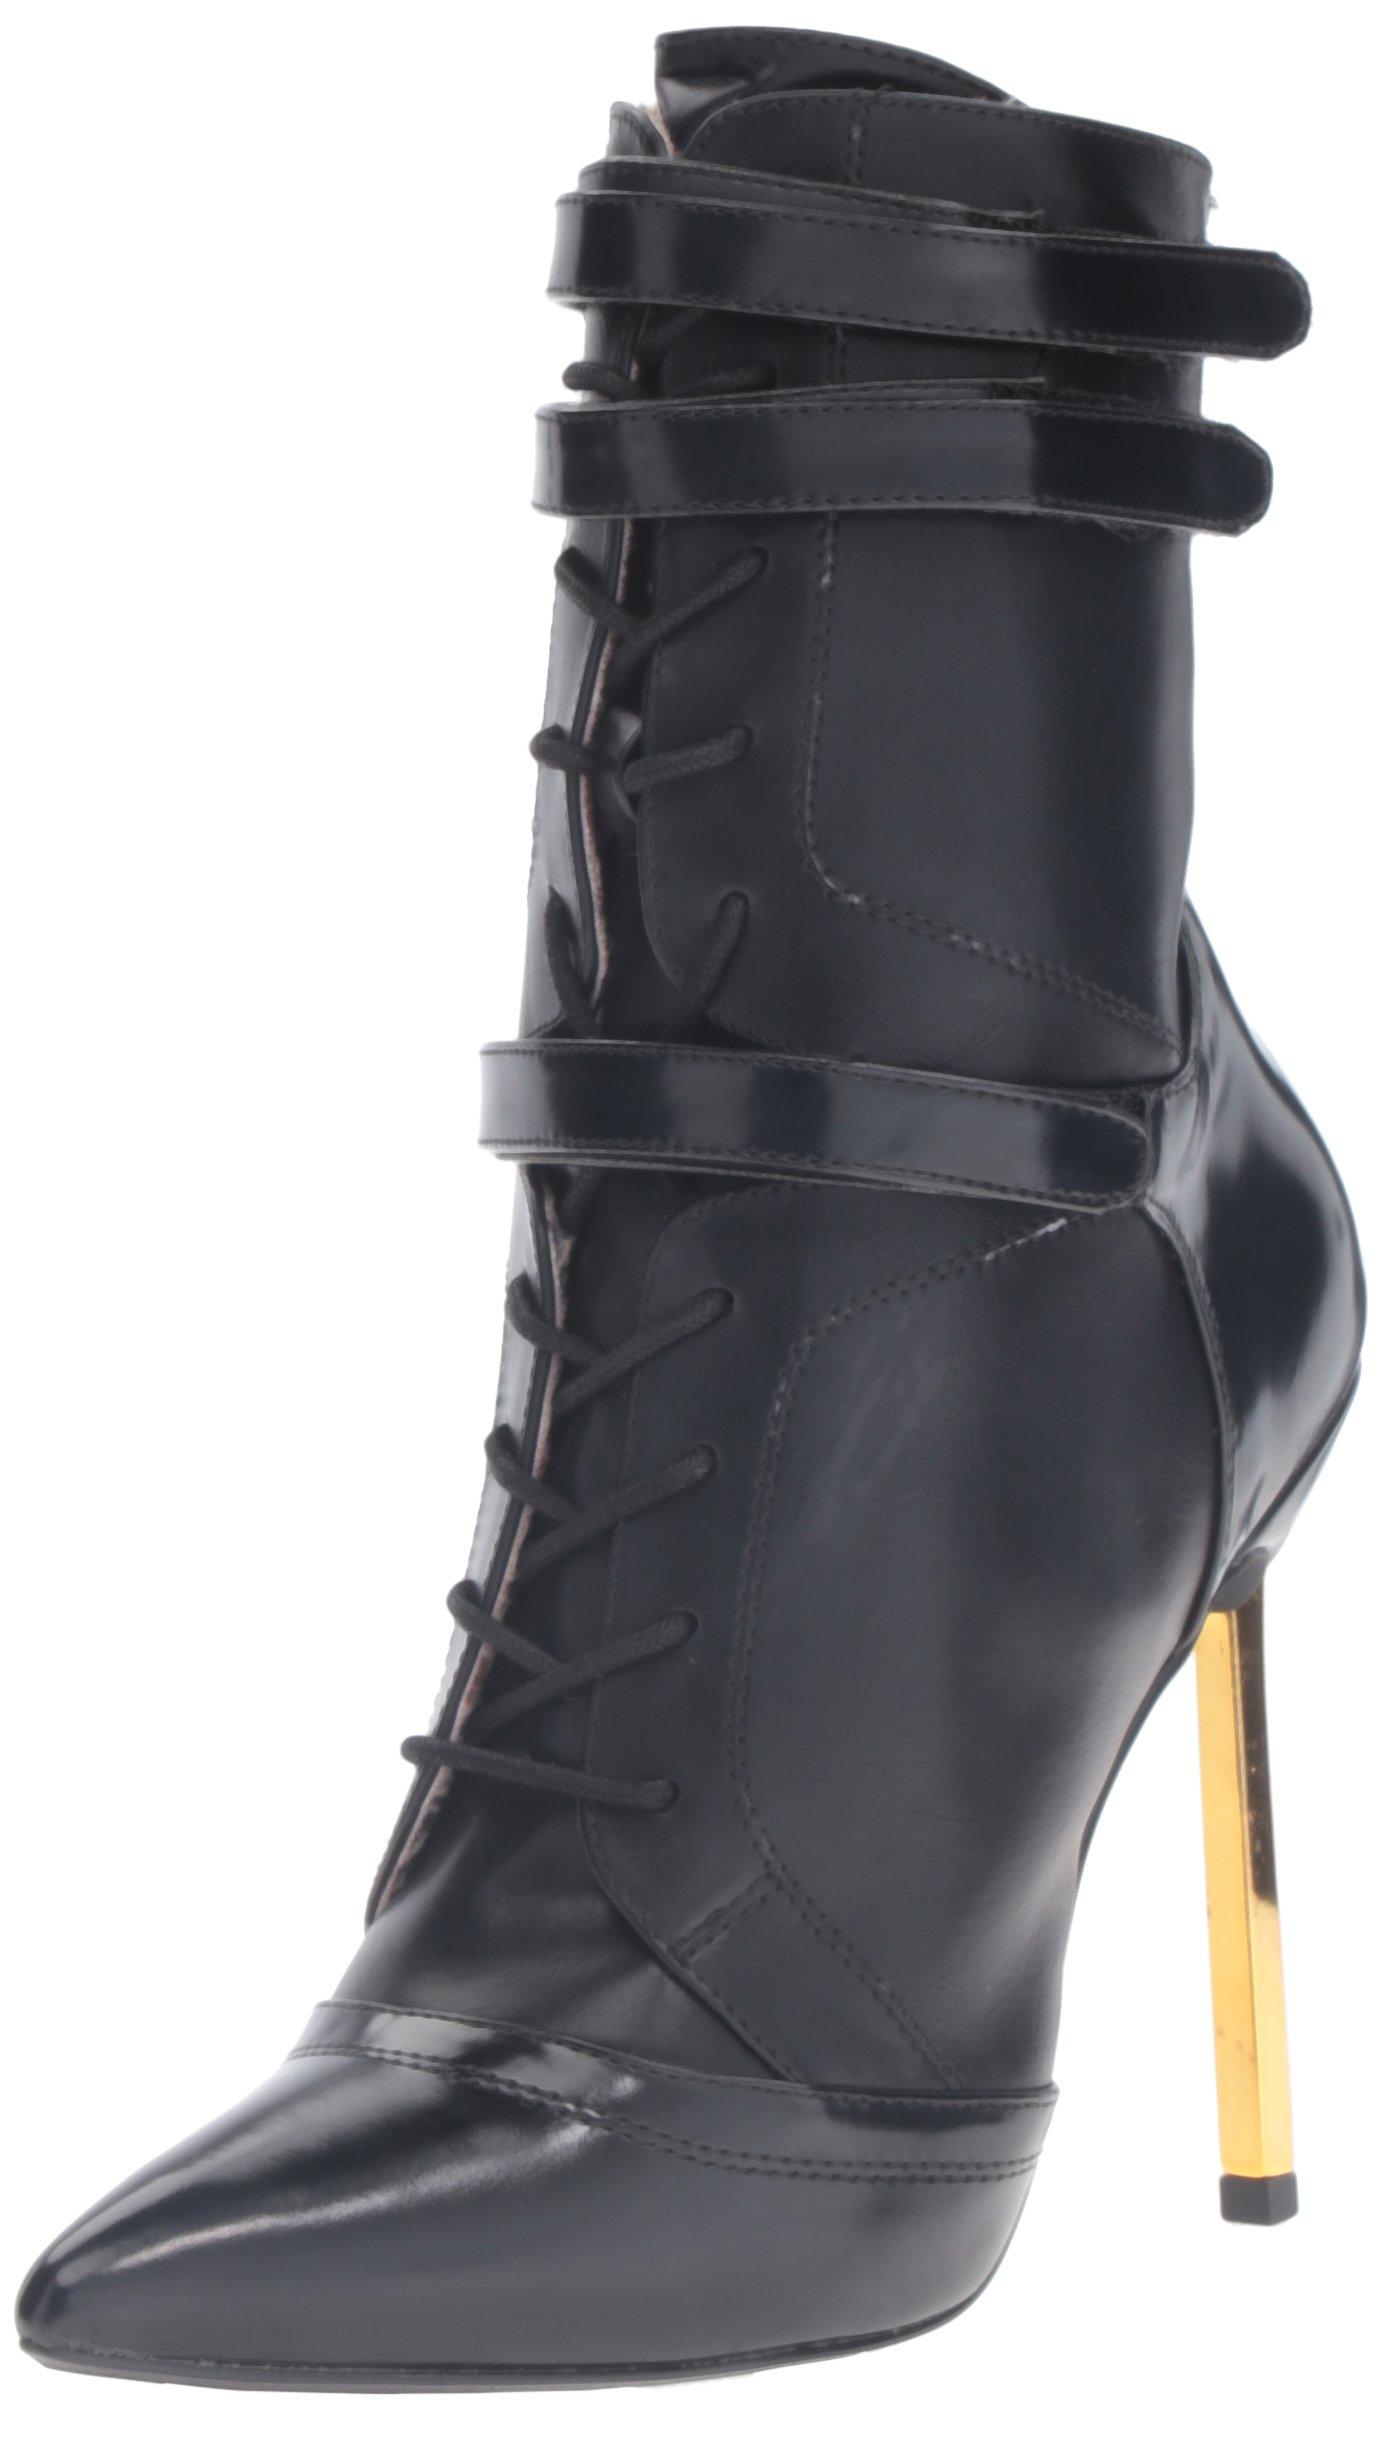 Luichiny Women's Fine by Me Ankle Bootie, Black, 7 M US